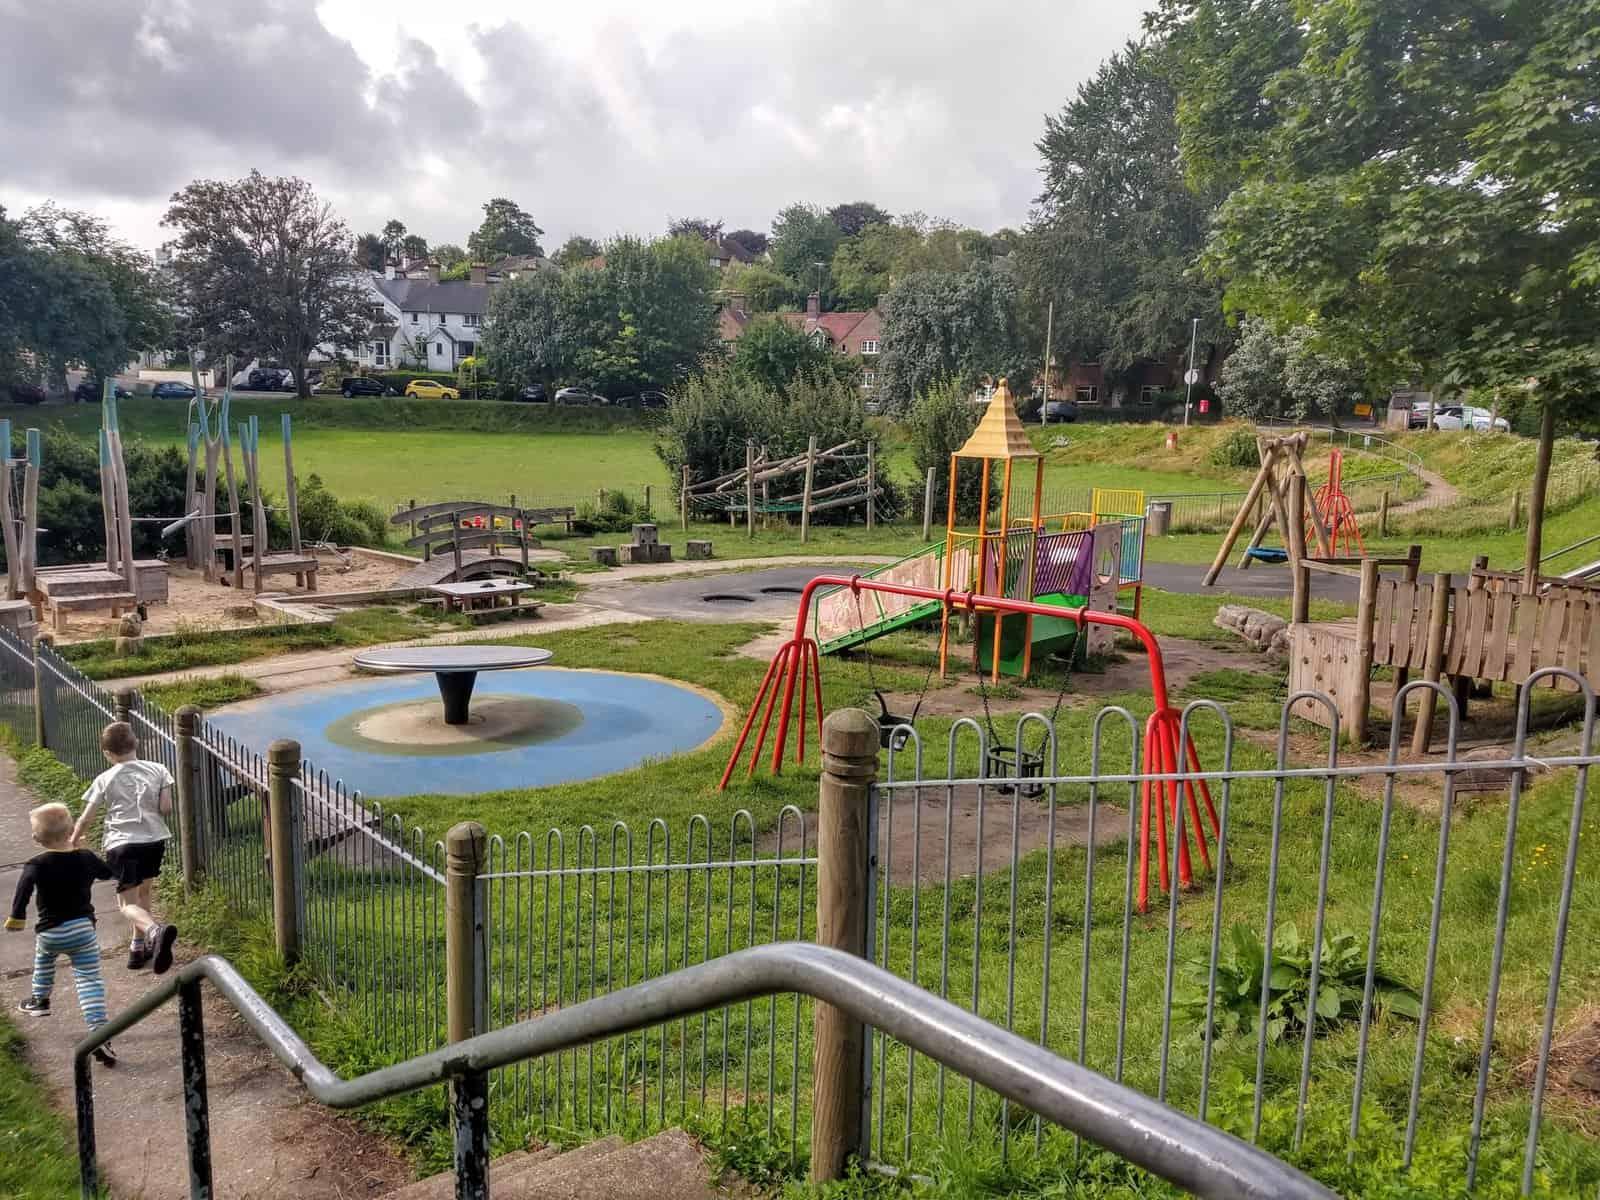 Nevill Recreation Ground